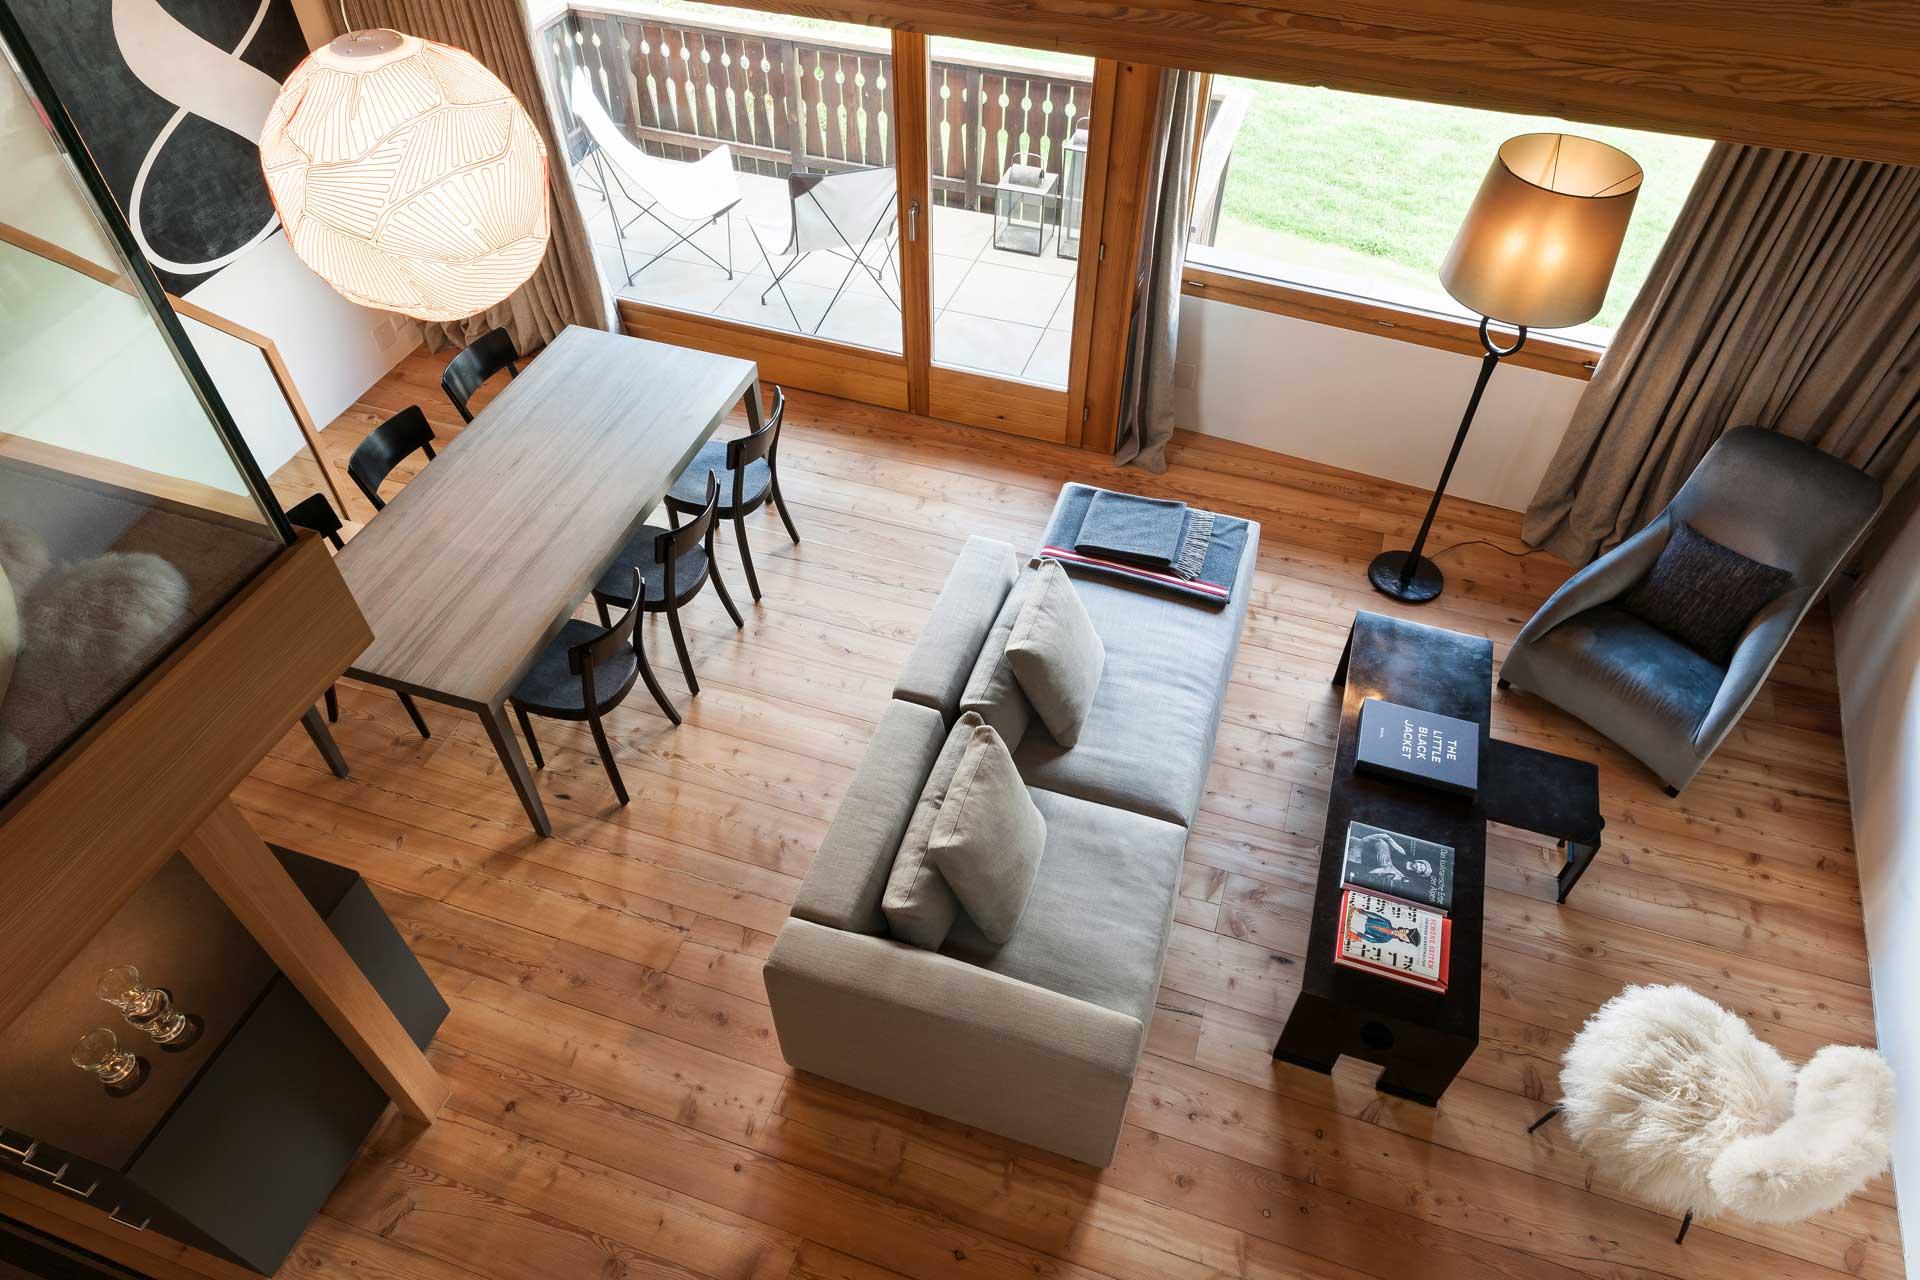 170_iria_degen_interiors_apartment_champfer2.jpg